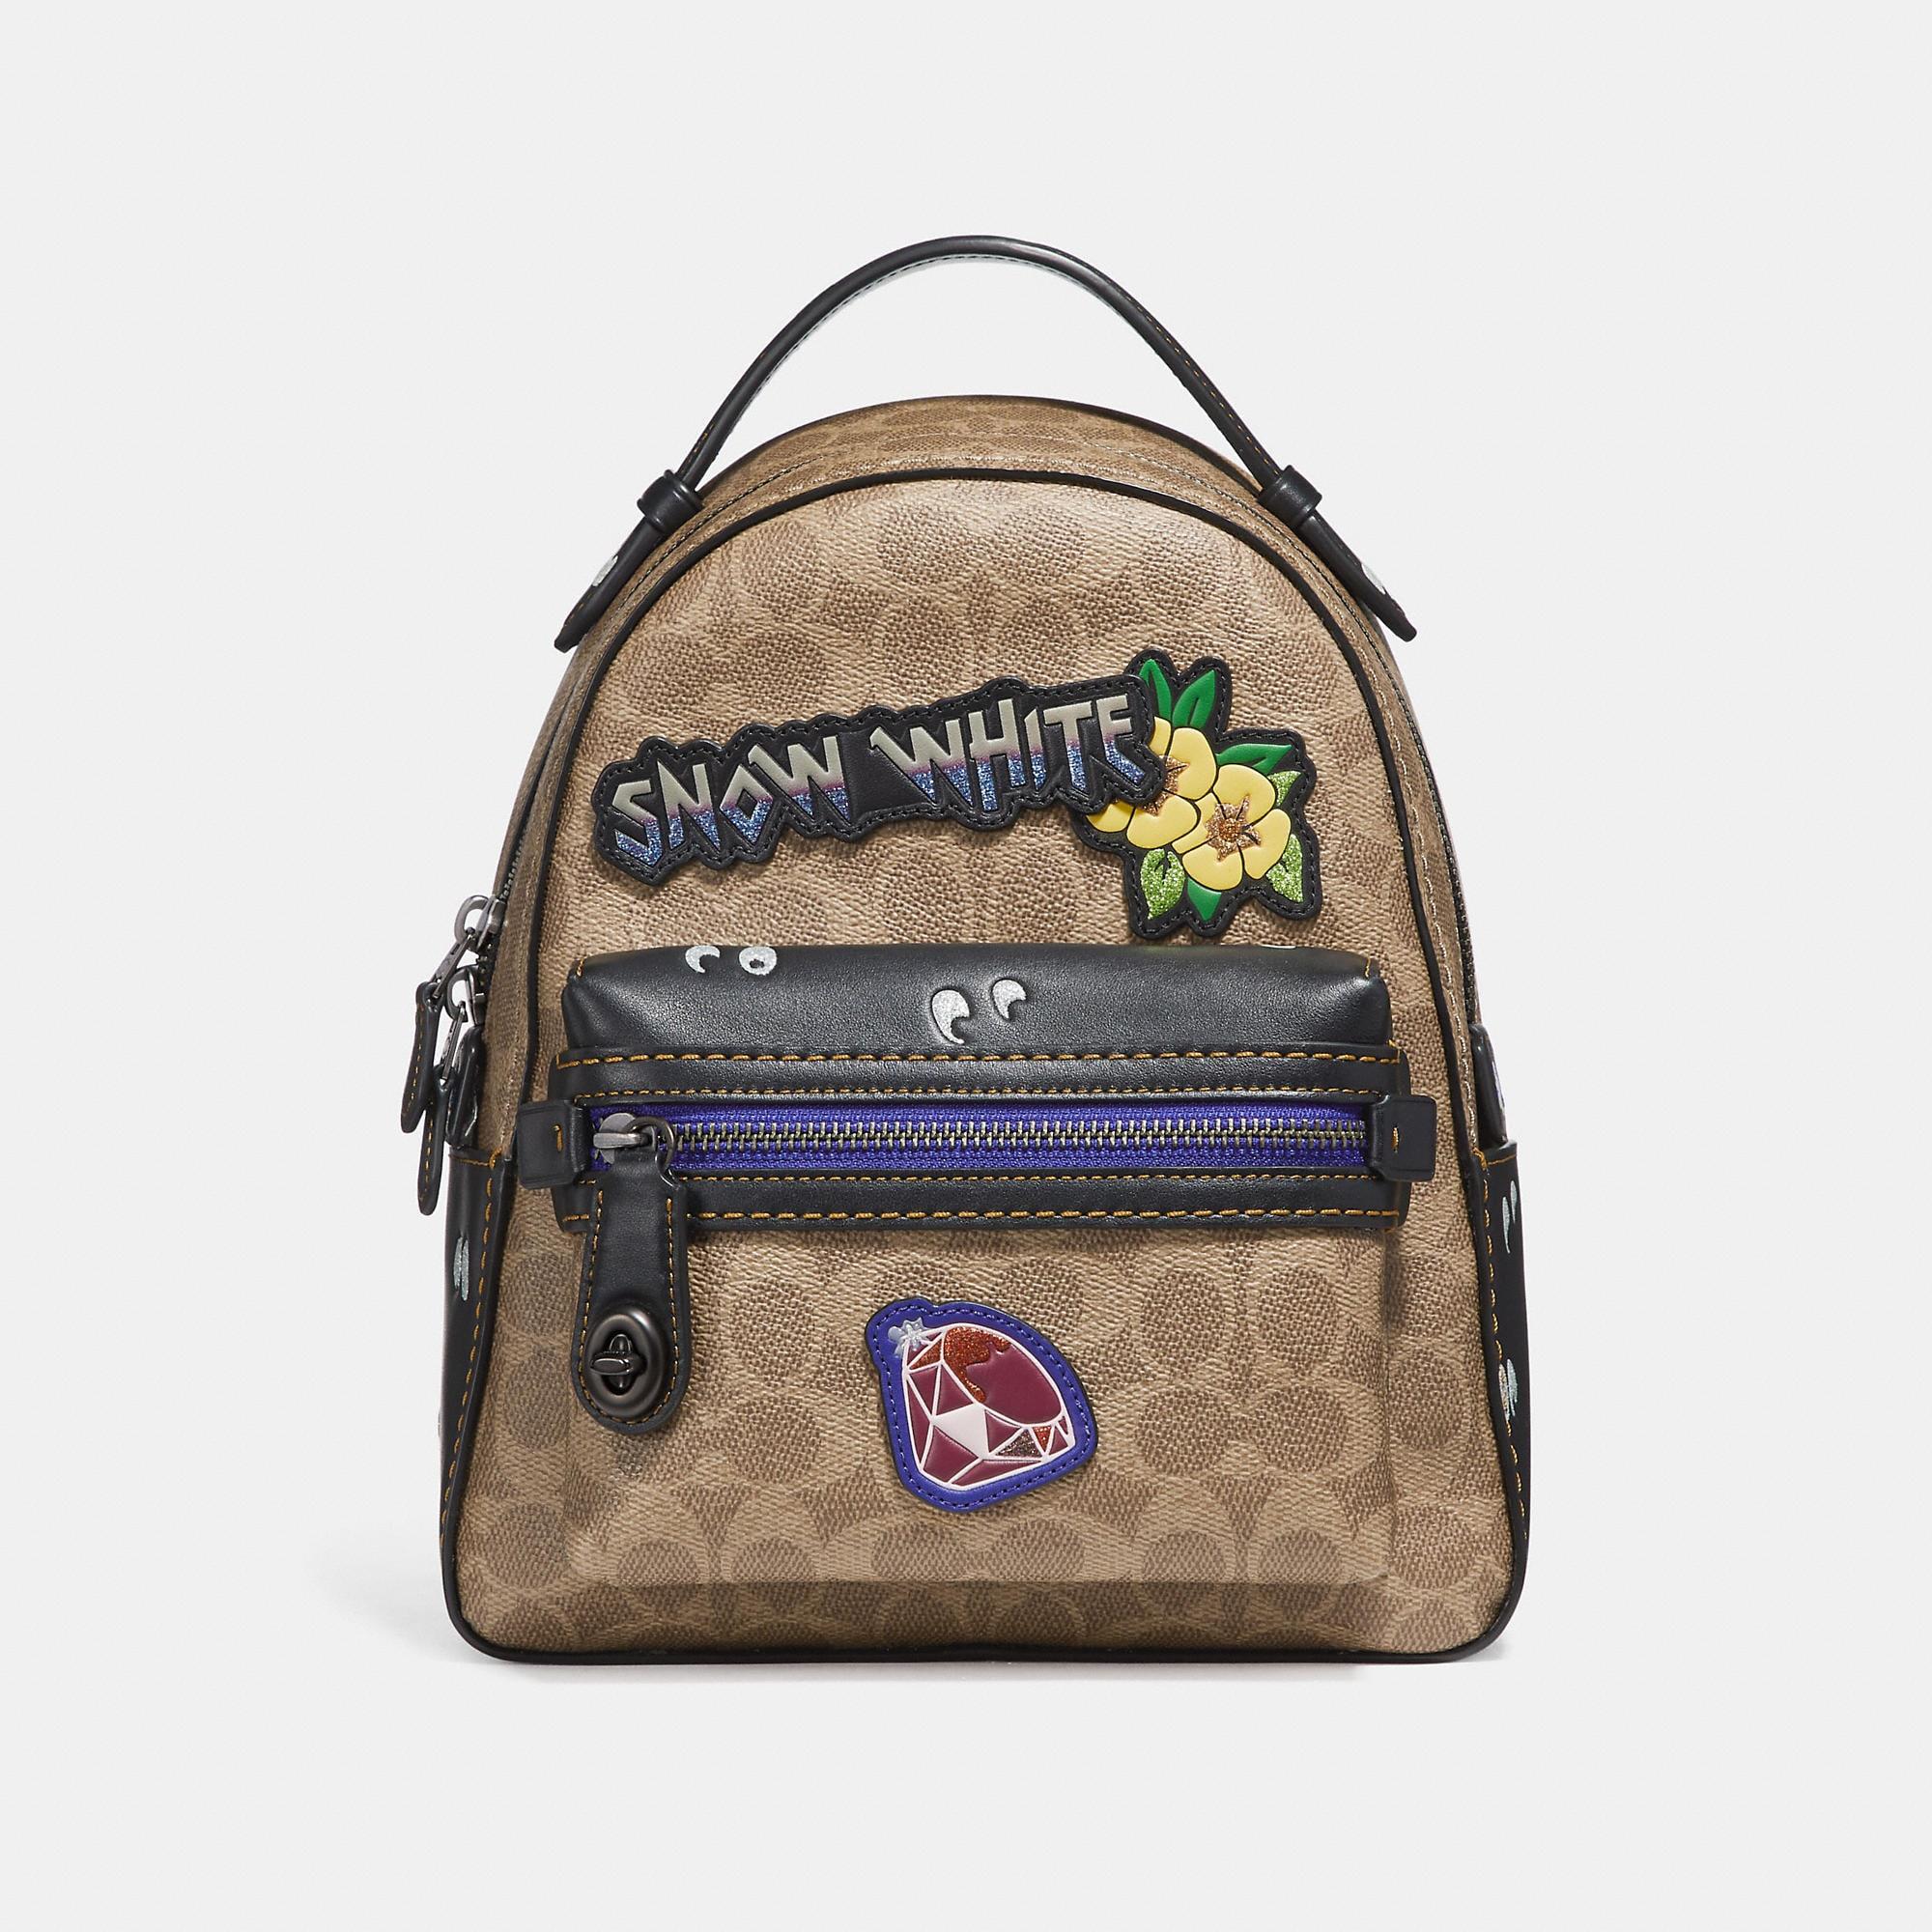 f747df09484 COACH Disney X Campus Backpack 23 In Signature Patchwork - Women S ...